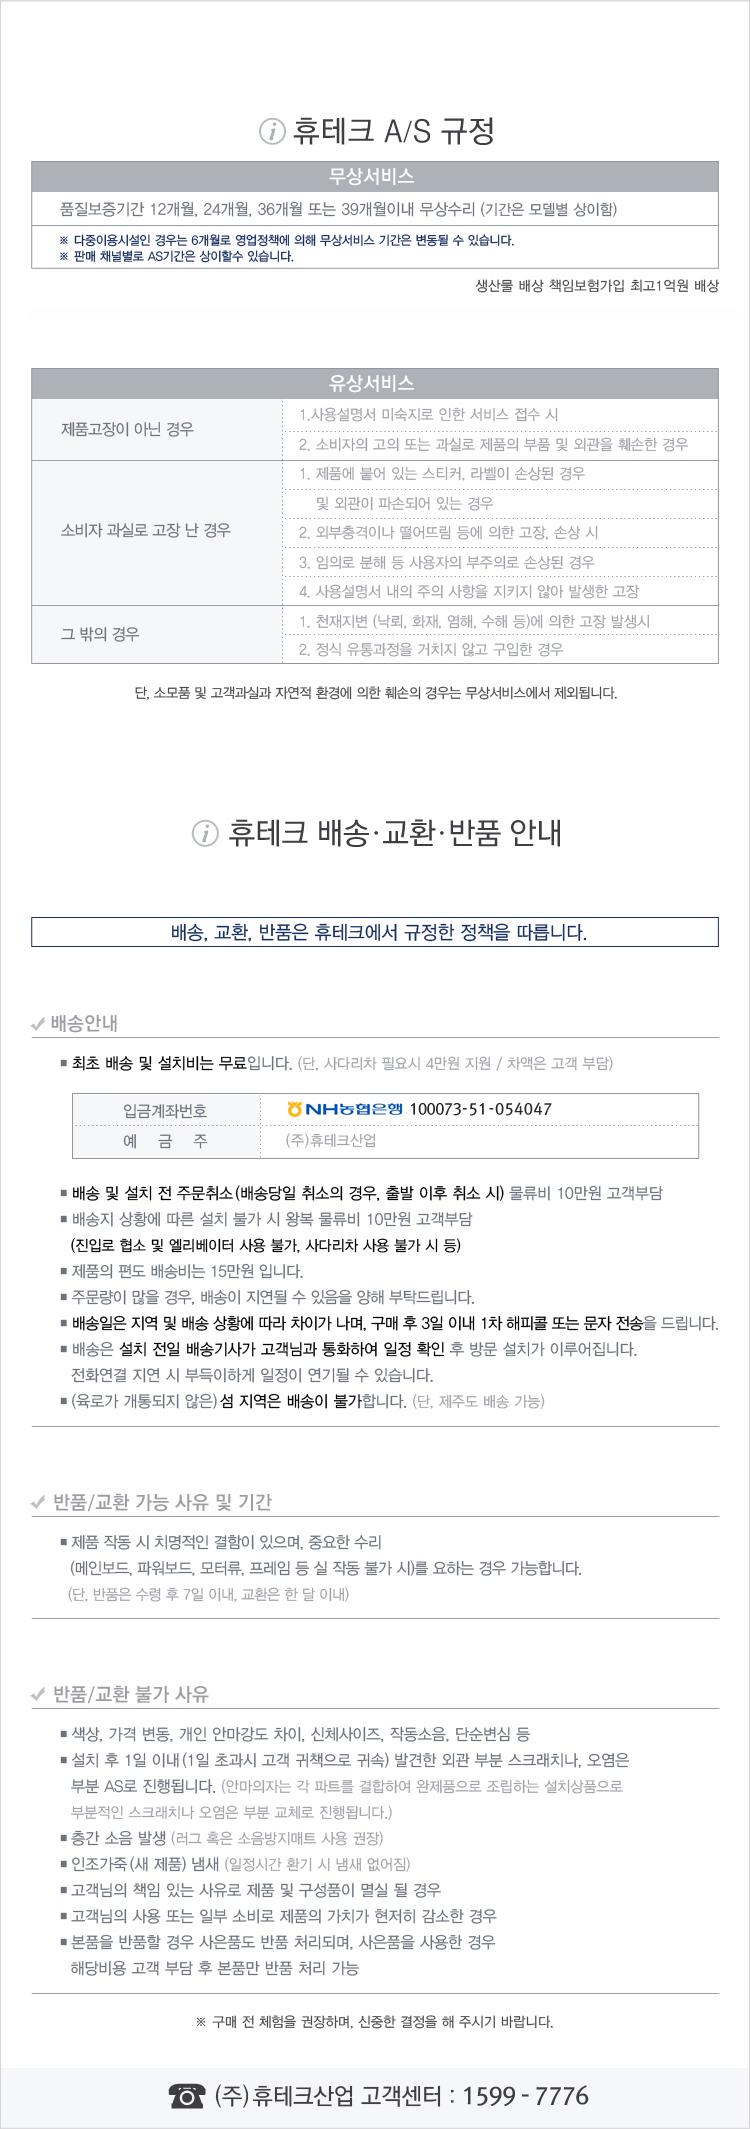 hutech_notice.jpg